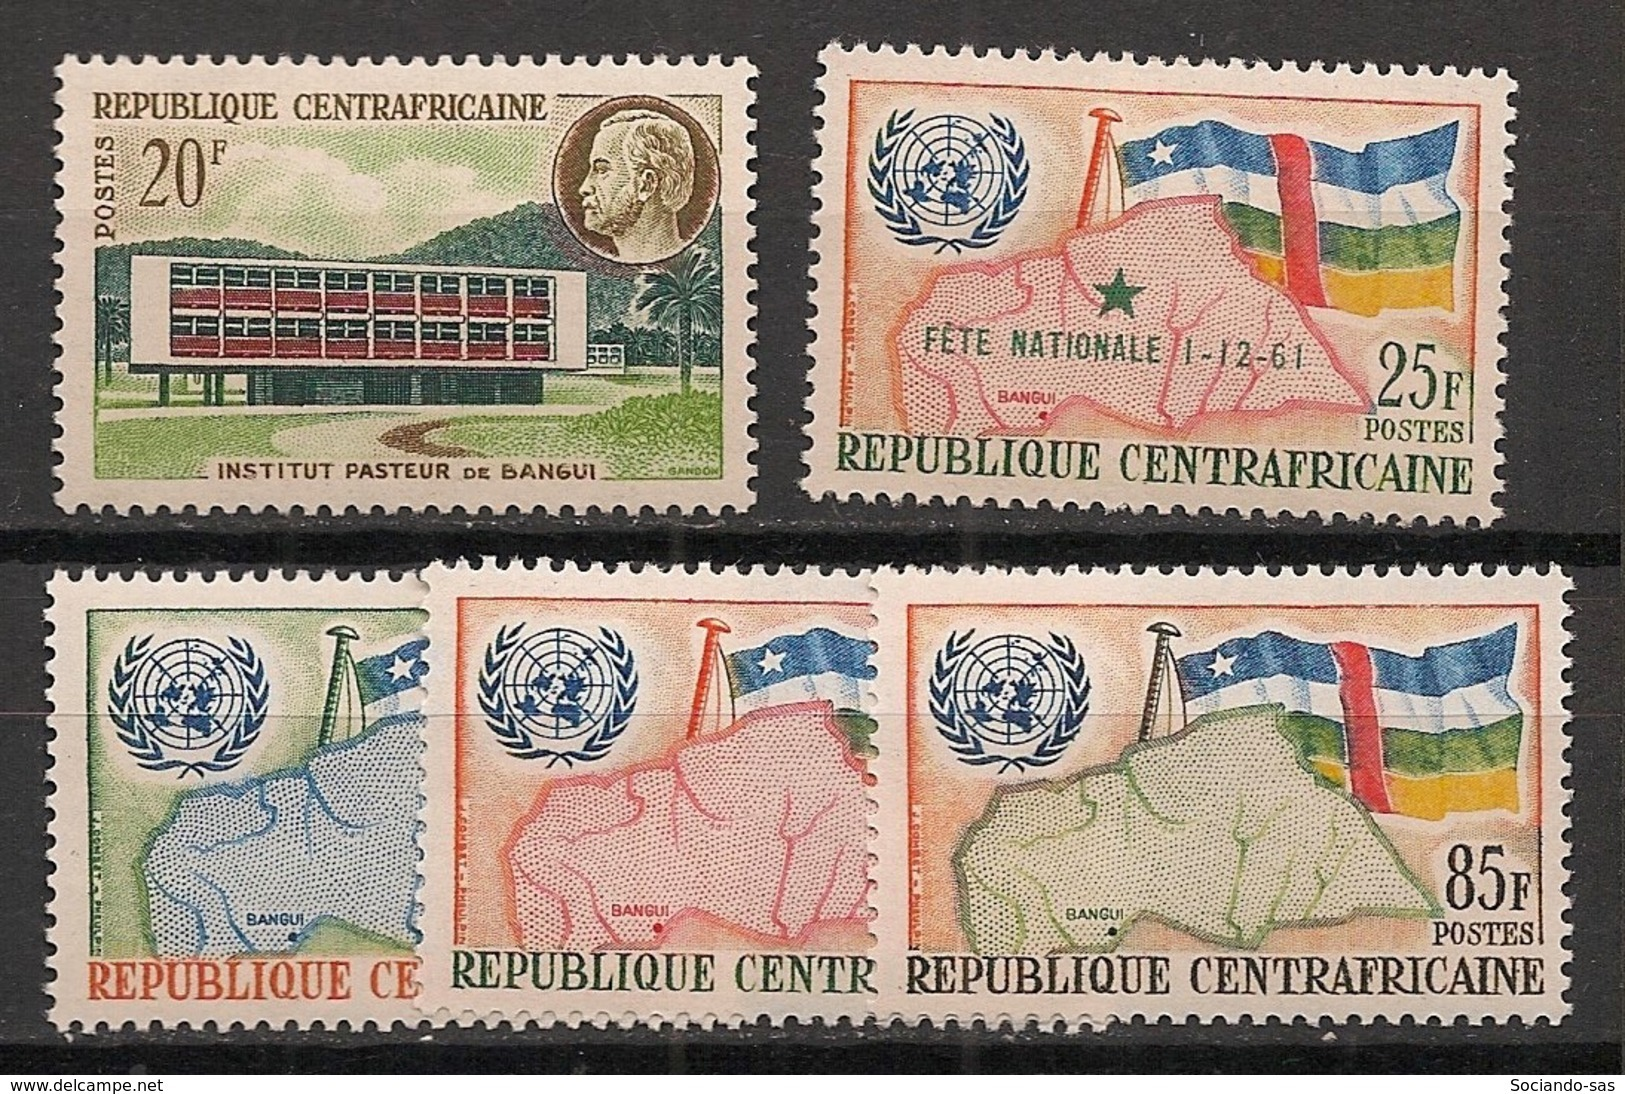 Centrafricaine - Année Complète 1961 - N°Yv. 13 à 17 - Complet 5 Valeurs - Neuf Luxe ** / MNH / Postfrisch - Zentralafrik. Republik